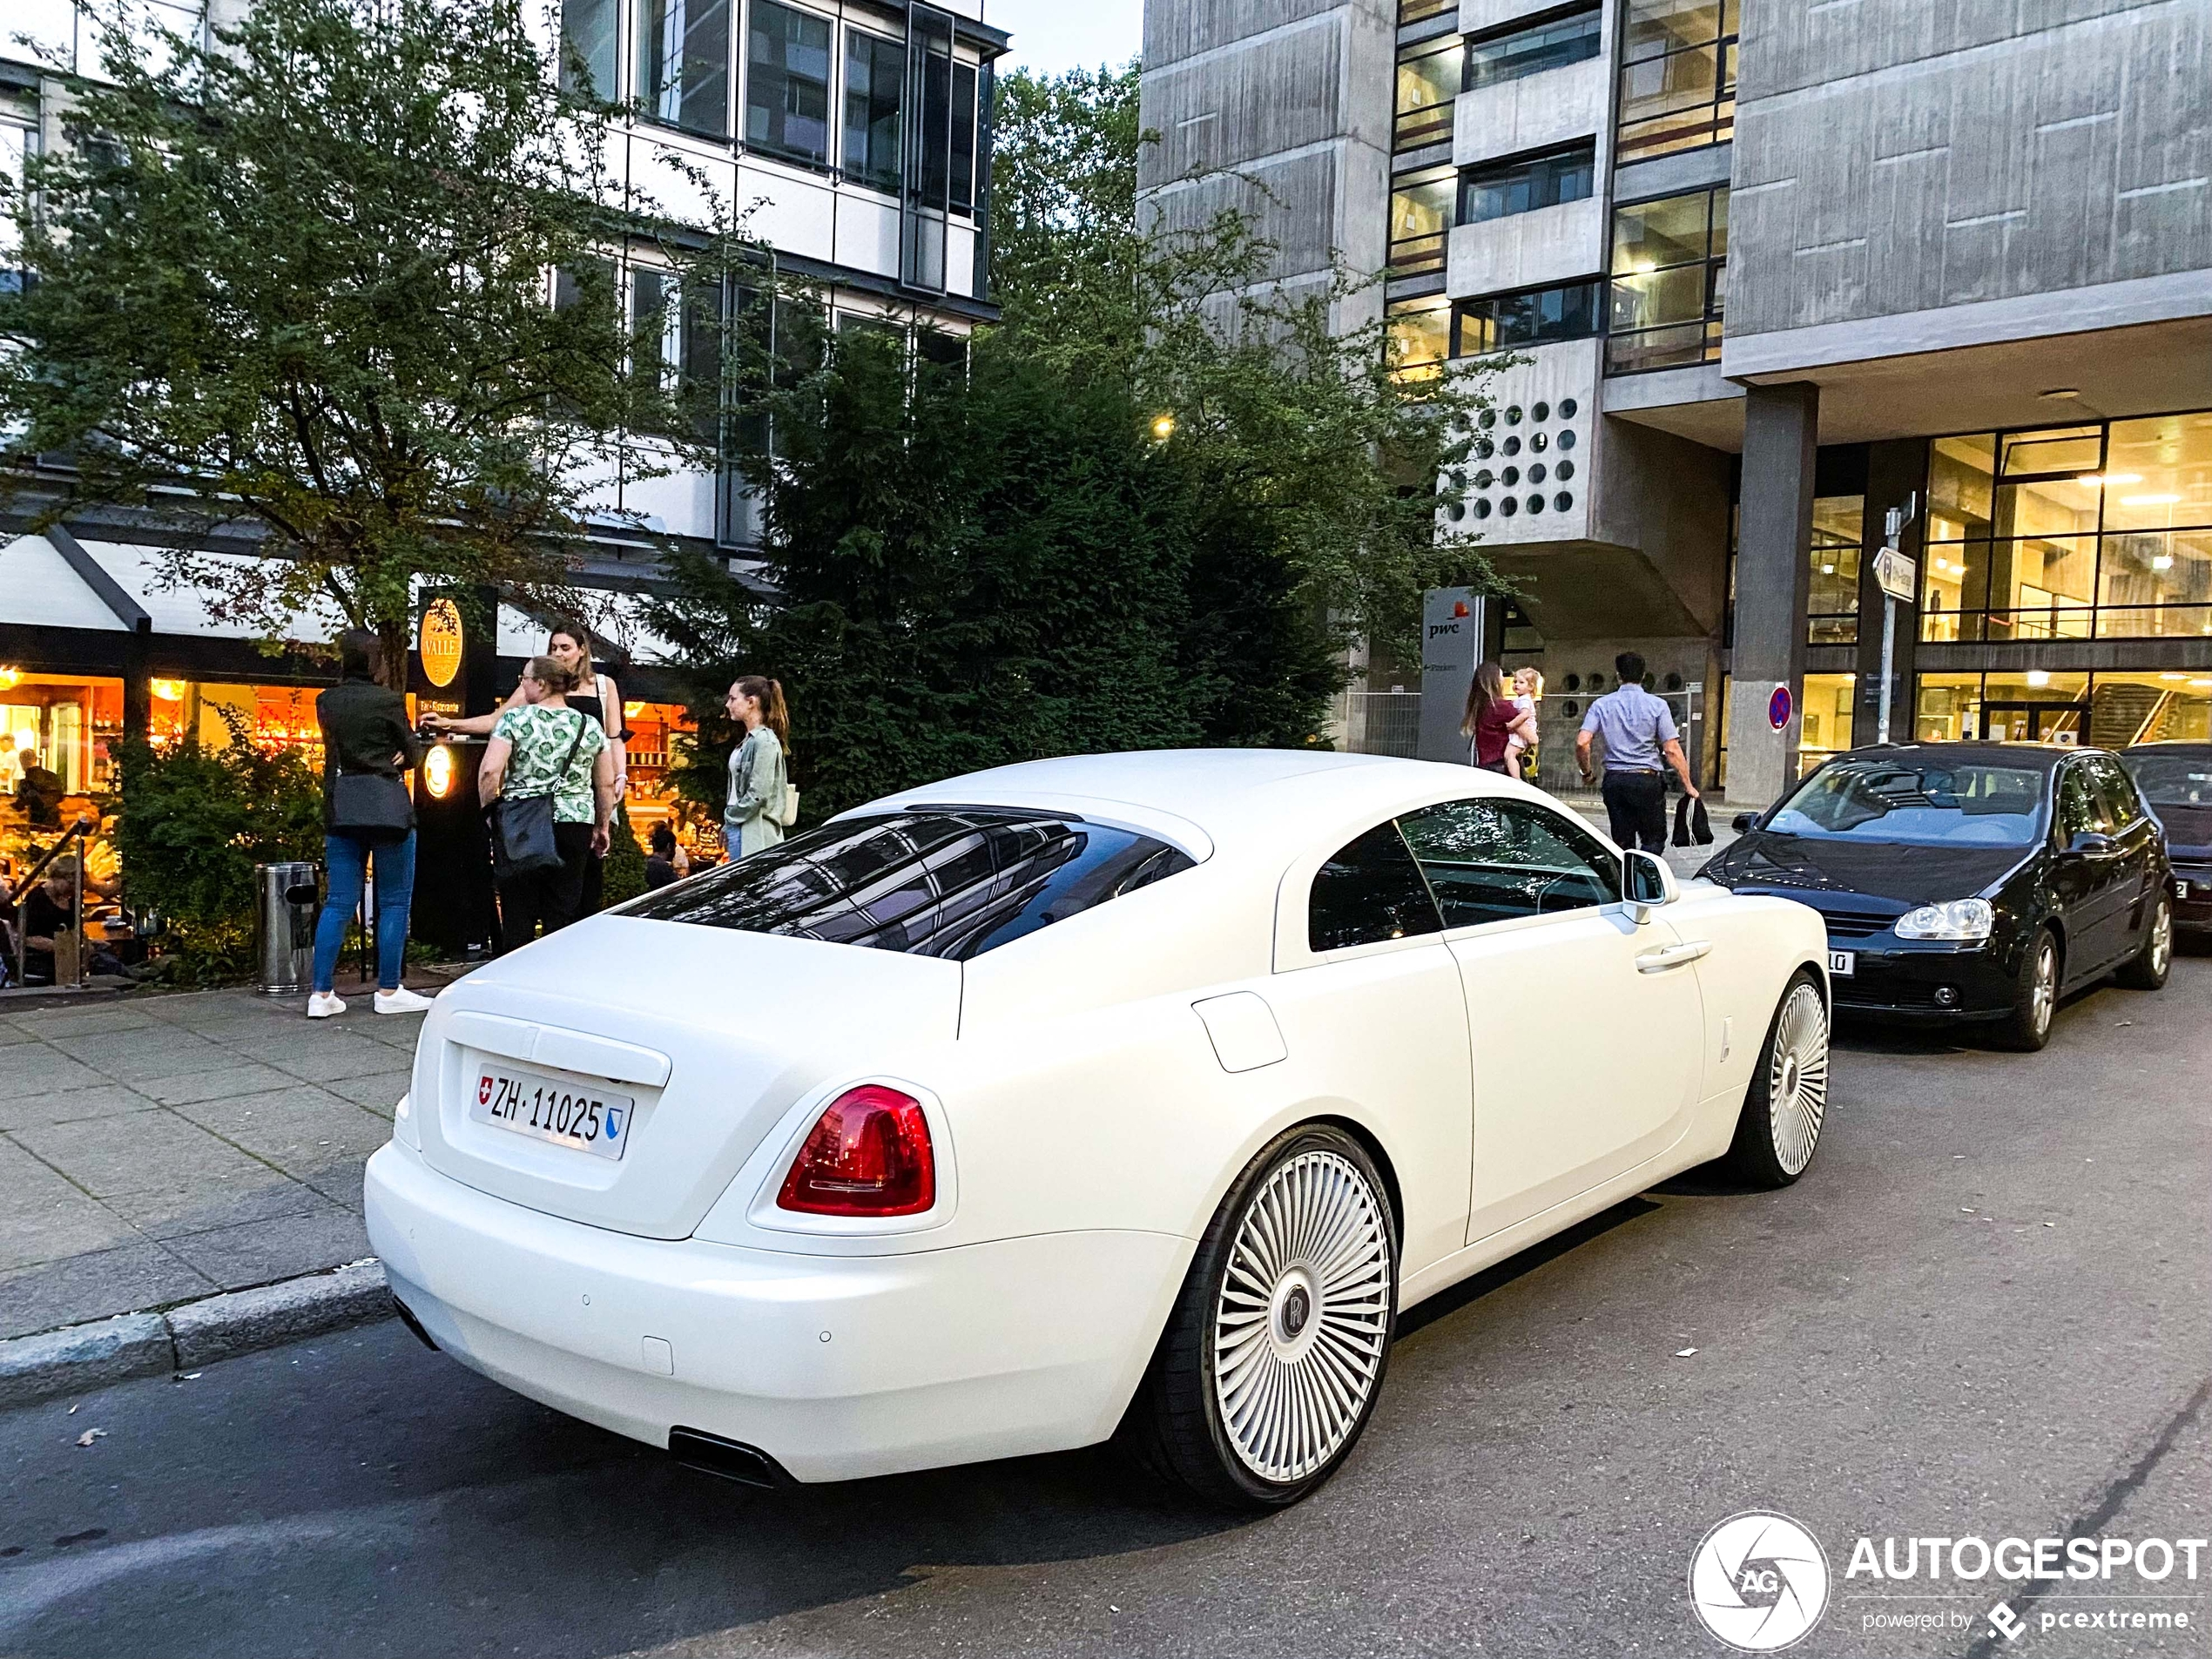 Rolls-Royce Wraith is volledig wit uitgevoerd